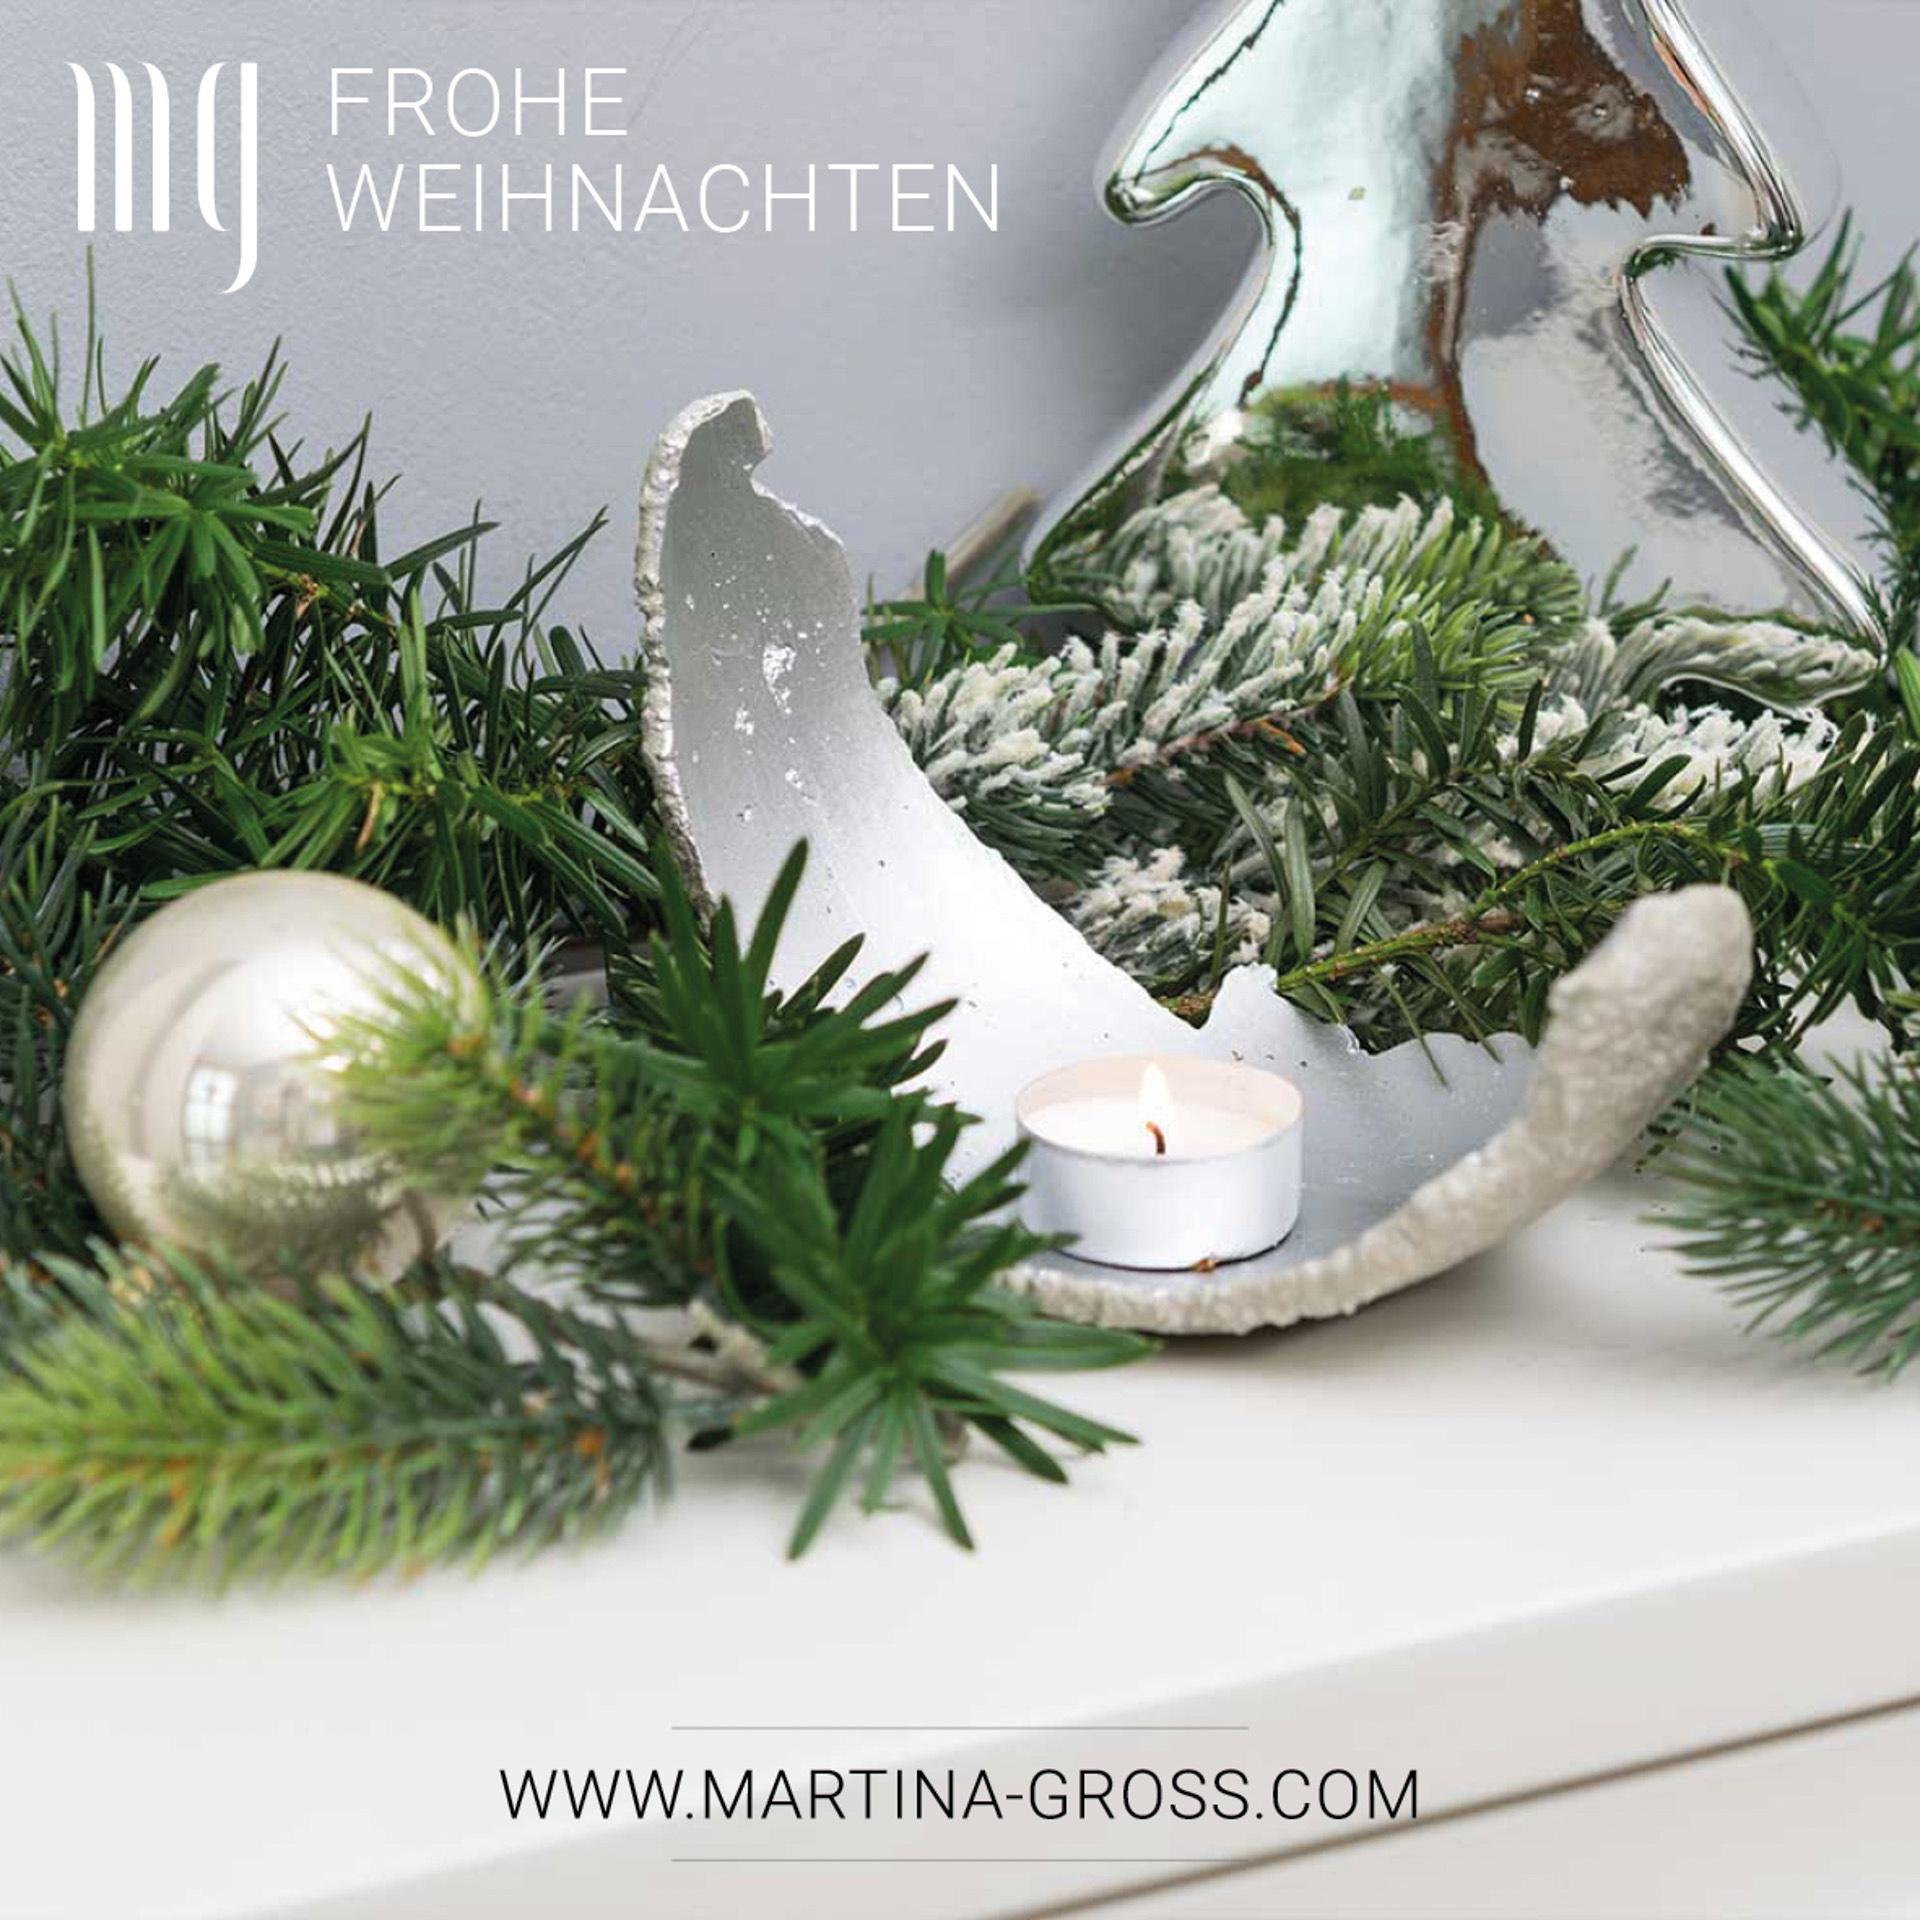 gniced-daniel gross-pfaffenhofen-grafikdesign-digital-assets-posting-18